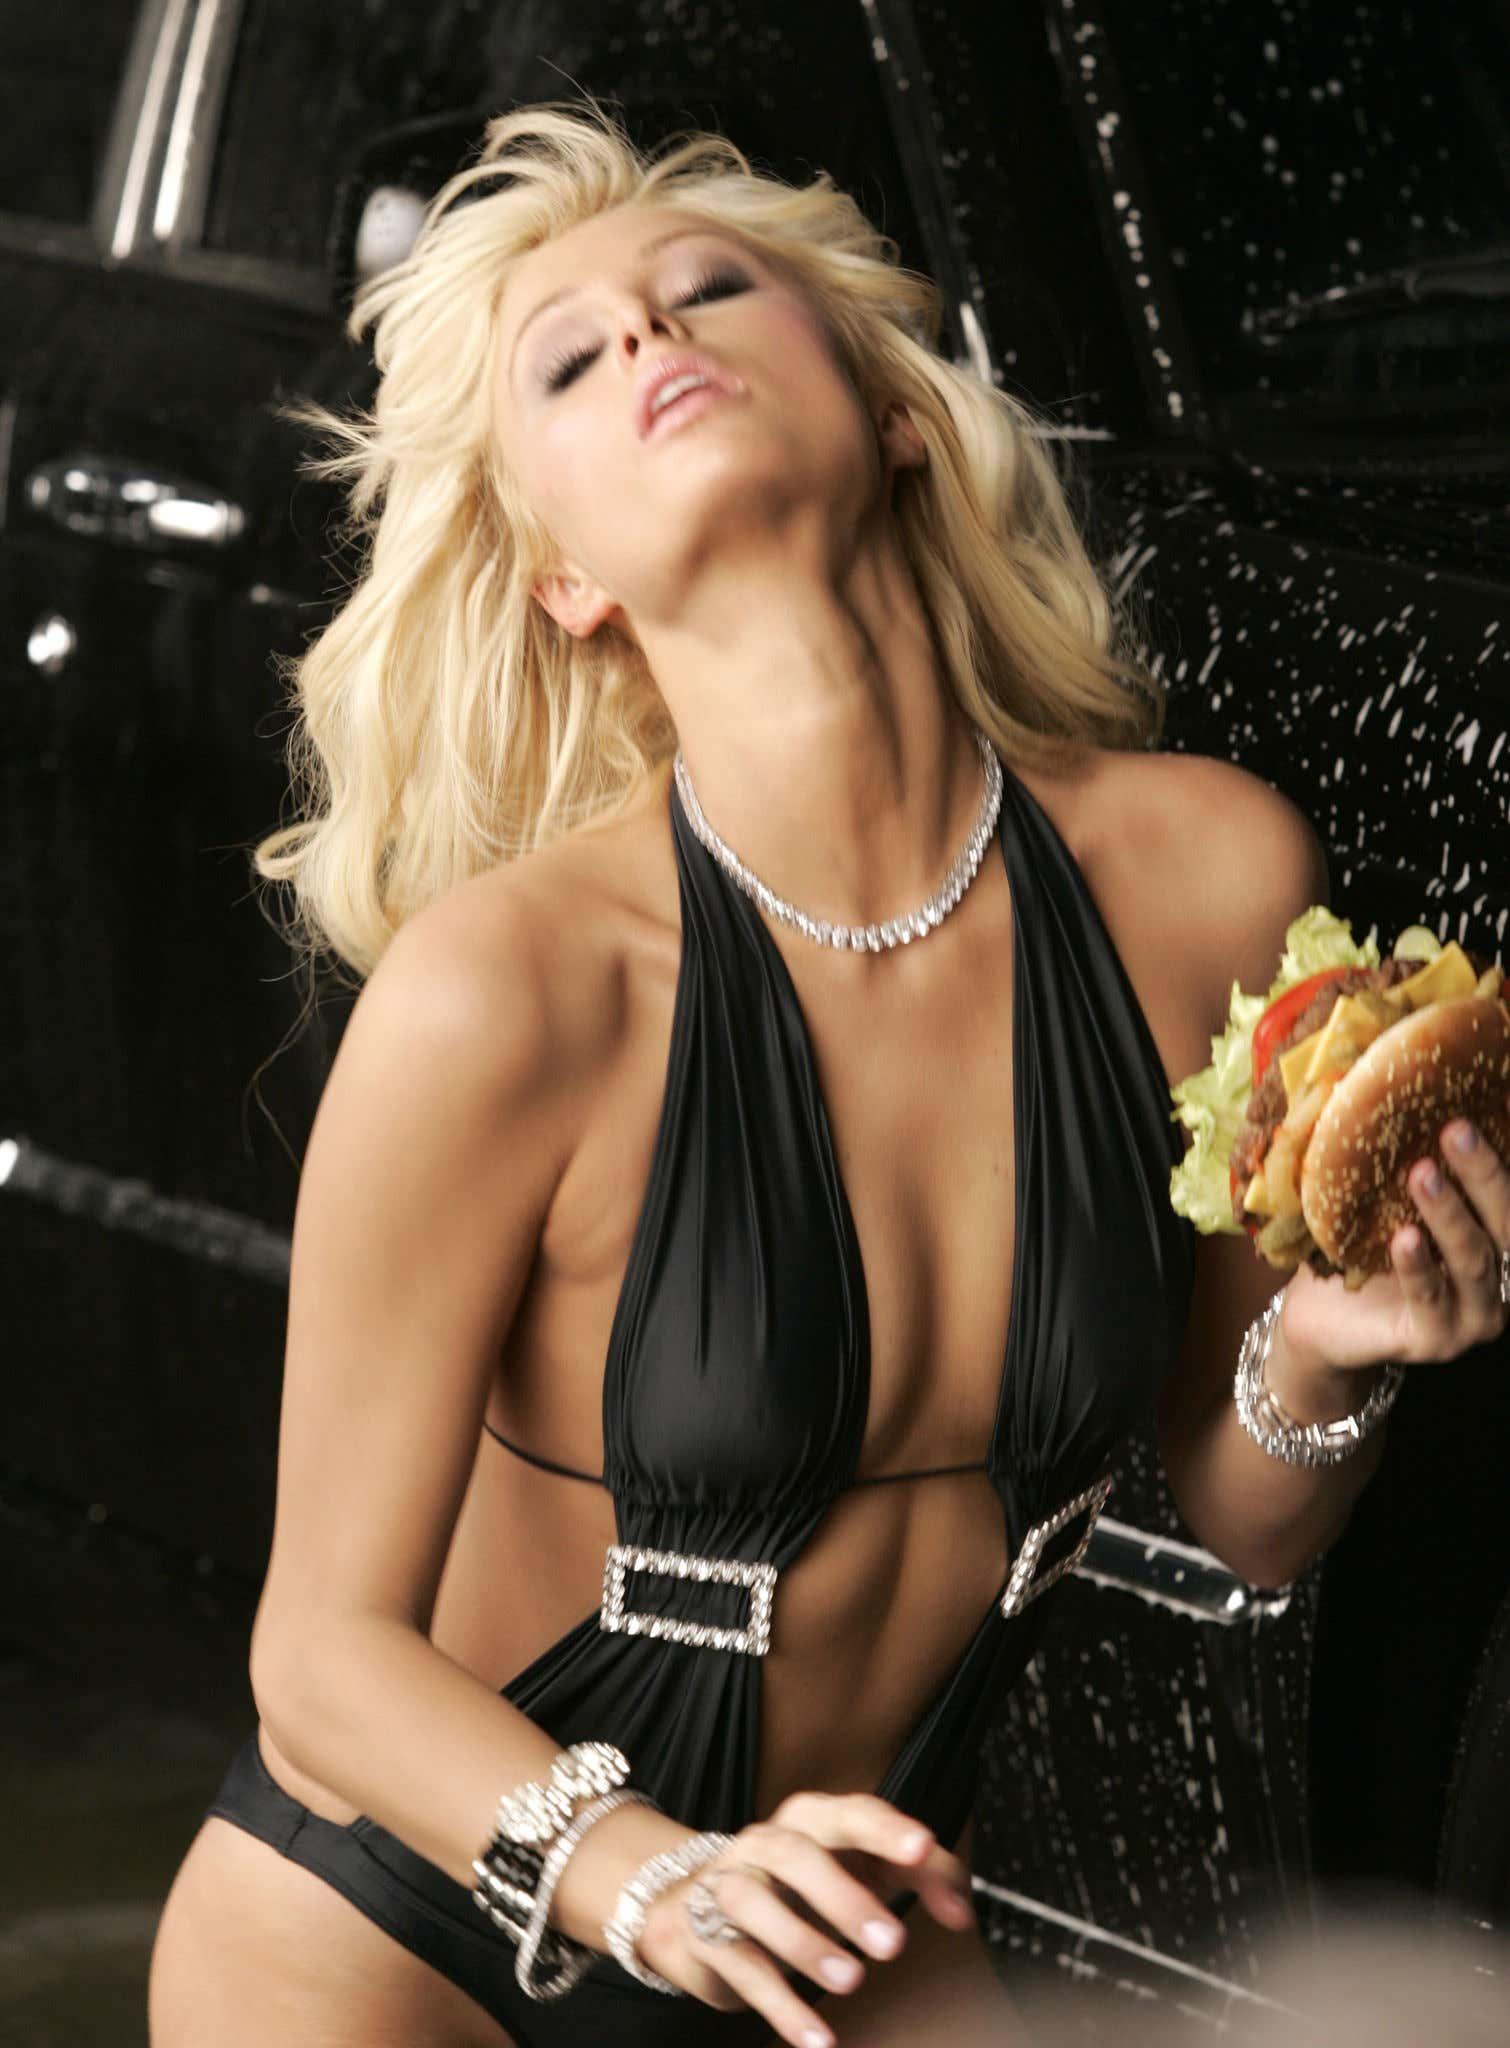 Paris Hilton Films Carl's Jr.'s New Ad for the Spicy BBQ Six Dollar Burger